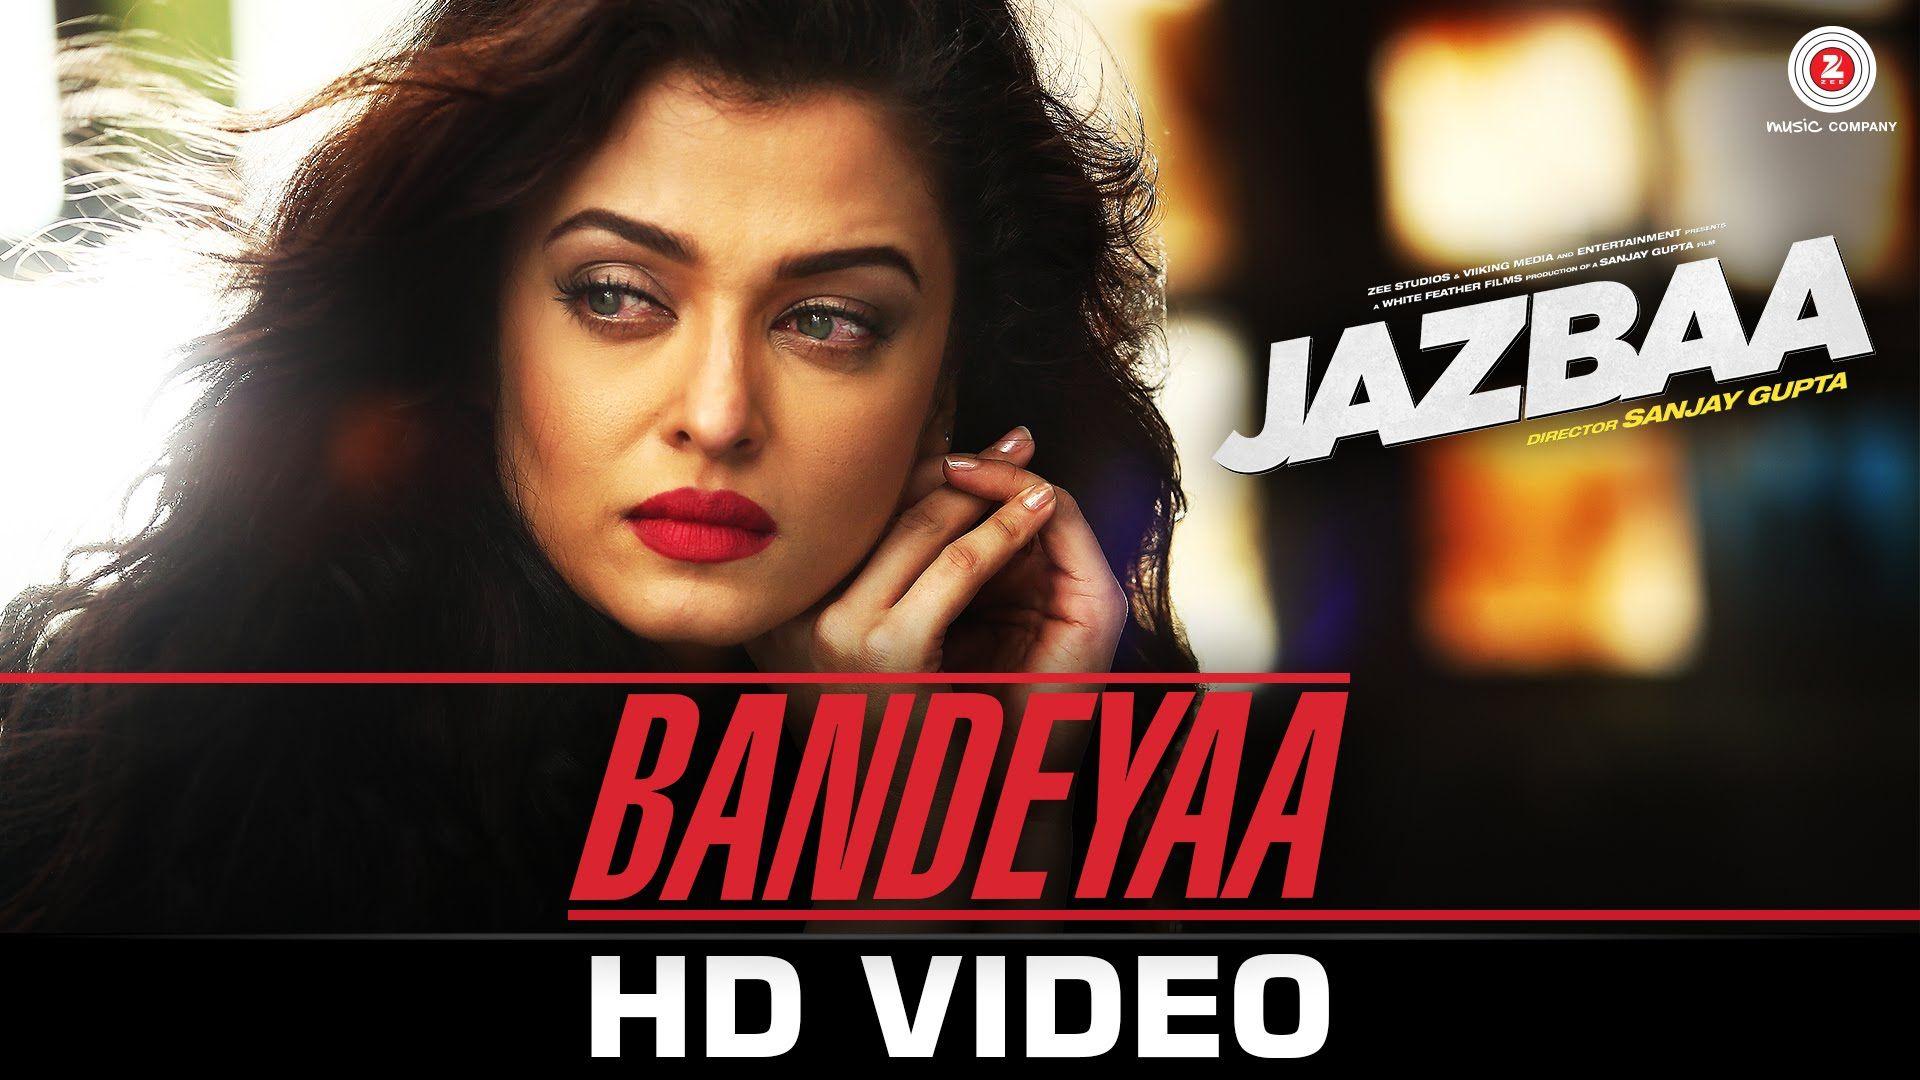 Video Bandeyaa Song Ft Aishwarya Rai Jazbaa Bollywood Music Videos Latest Bollywood Songs Songs